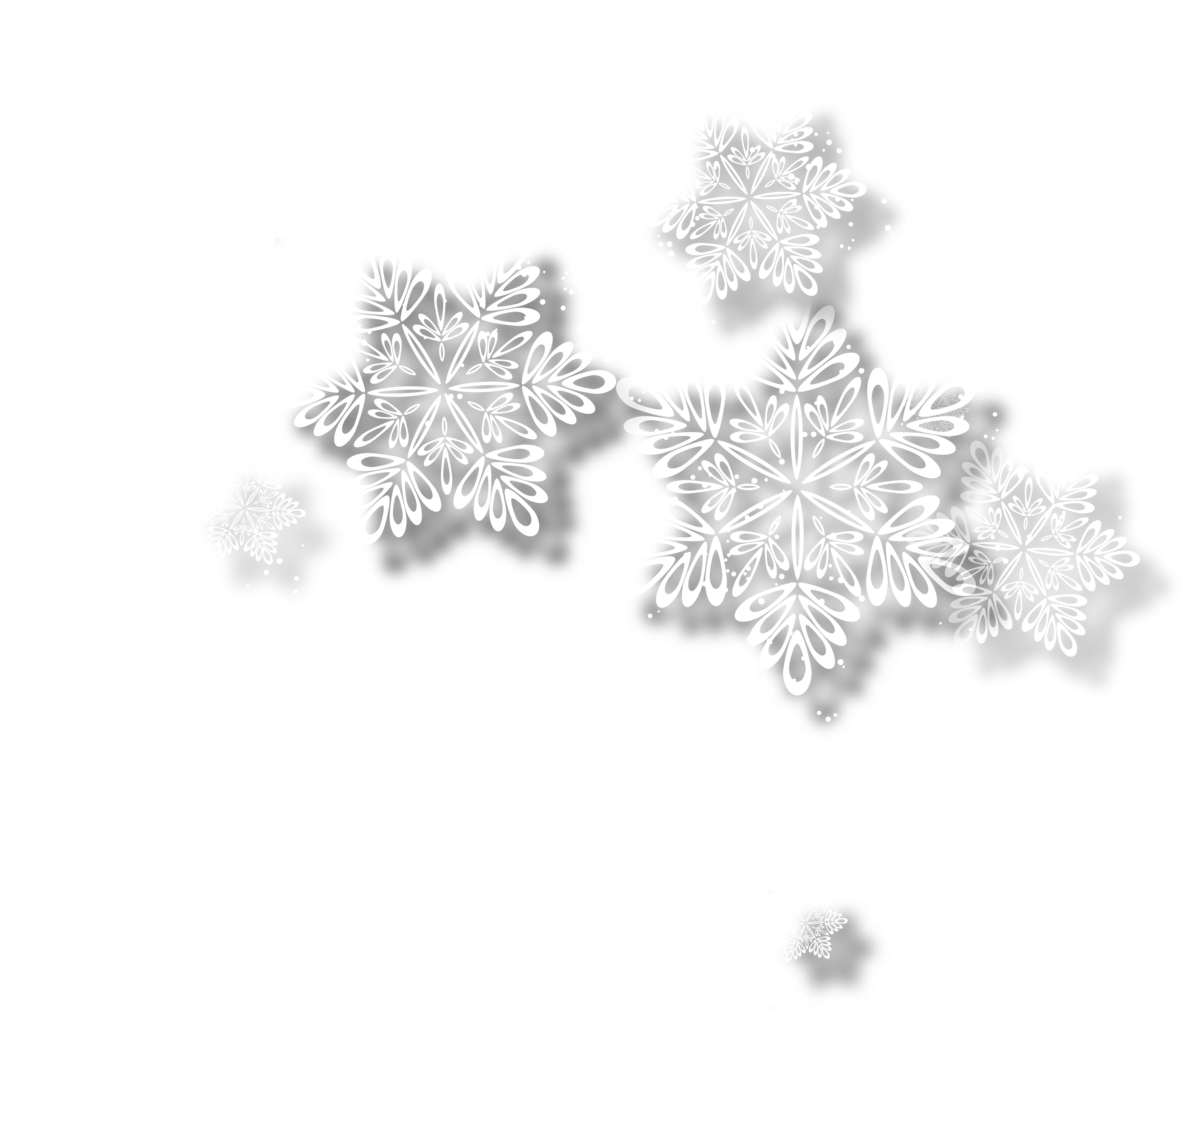 картинки белых снежинок без фона африке